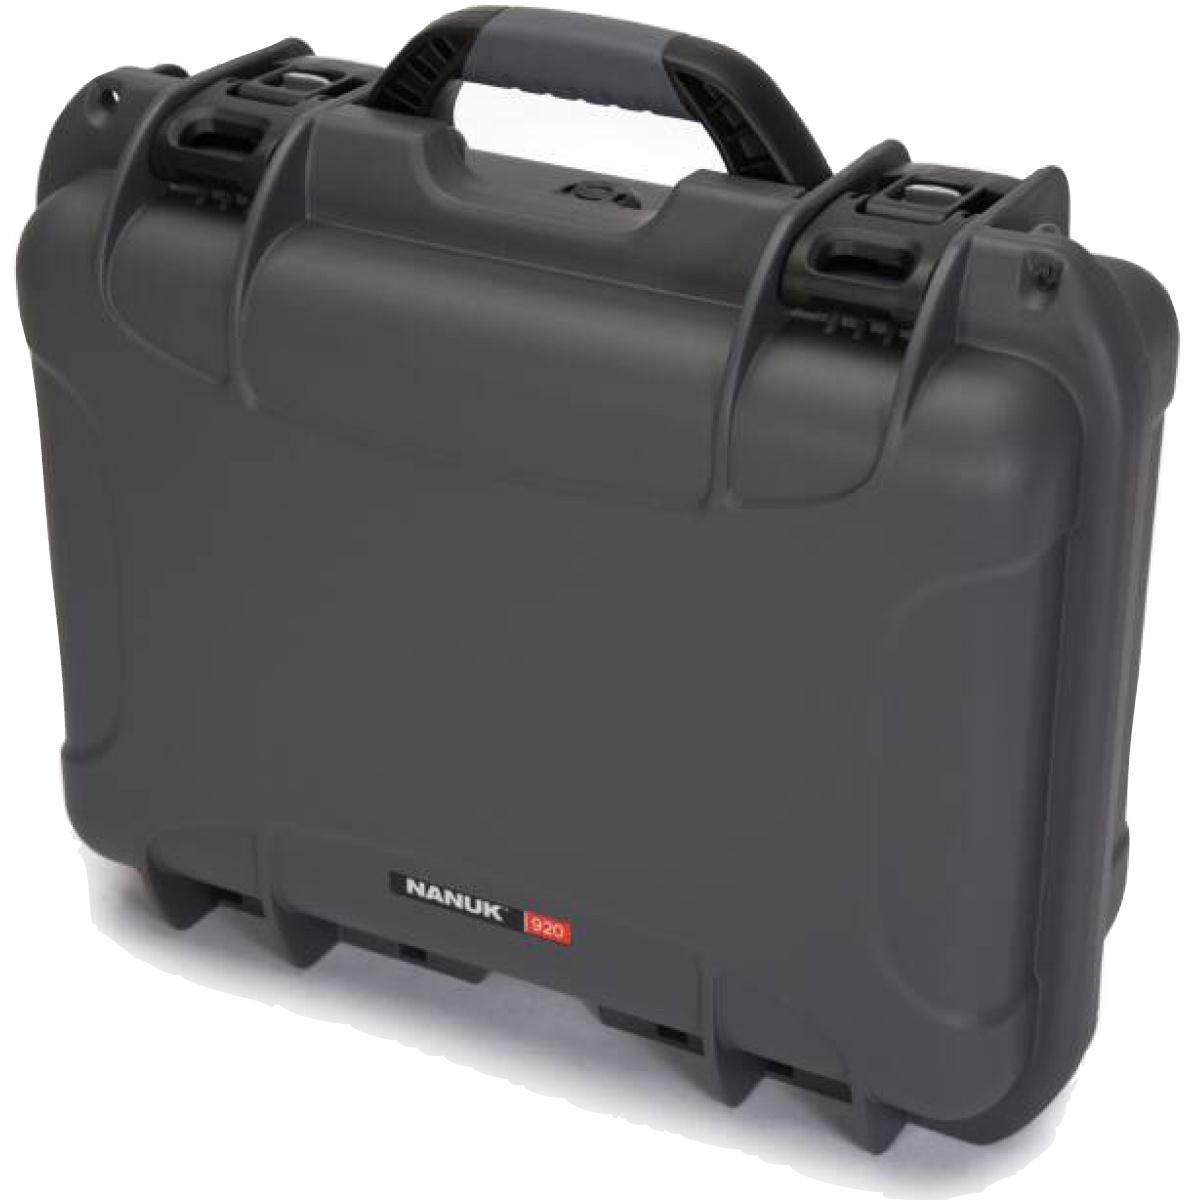 Nanuk Koffer 920 für Sony A7 Anthrazit